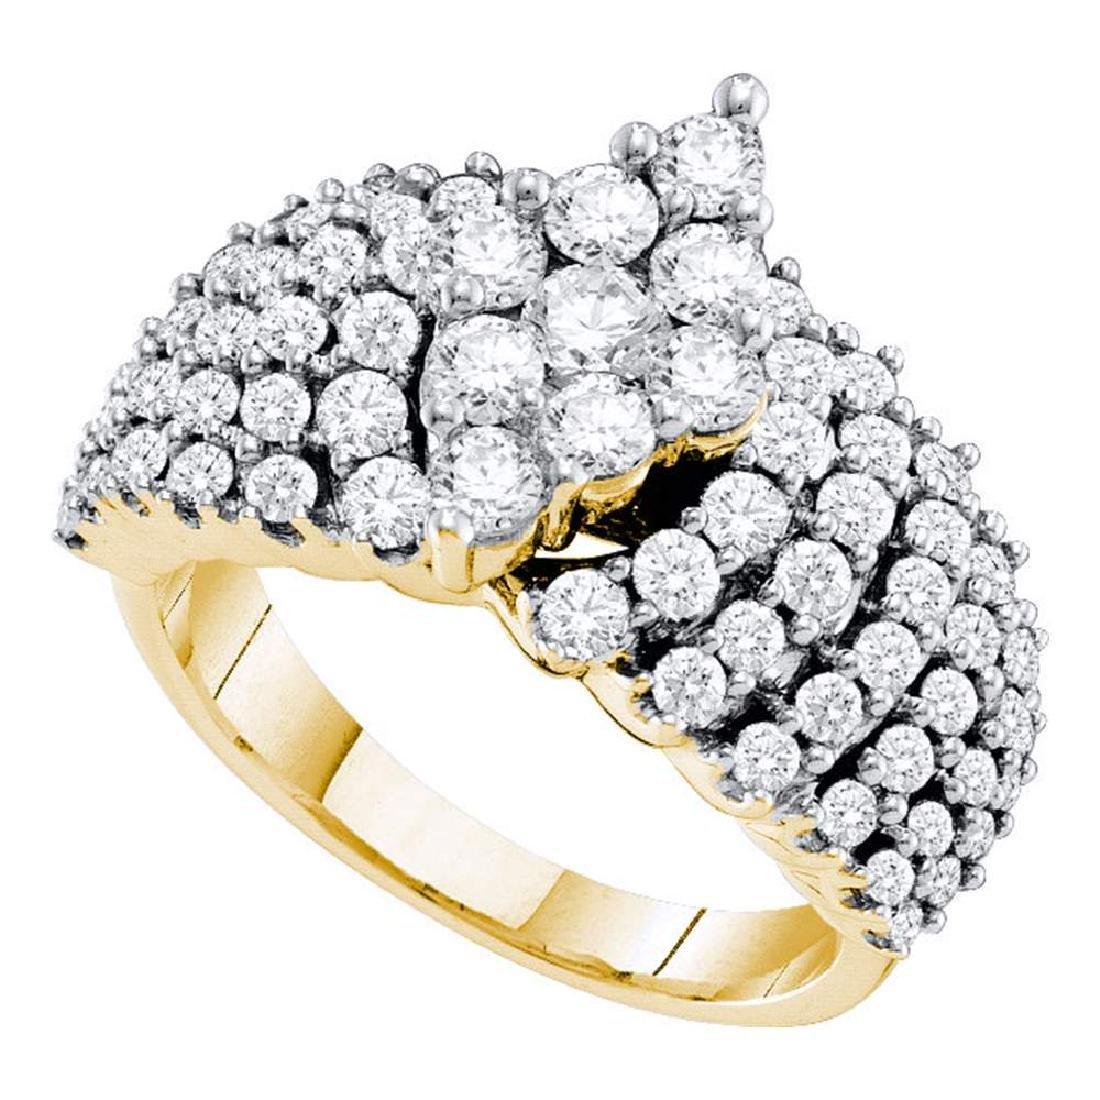 2 CTW Pave-set Diamond Oval-shape Cluster Ring 14KT